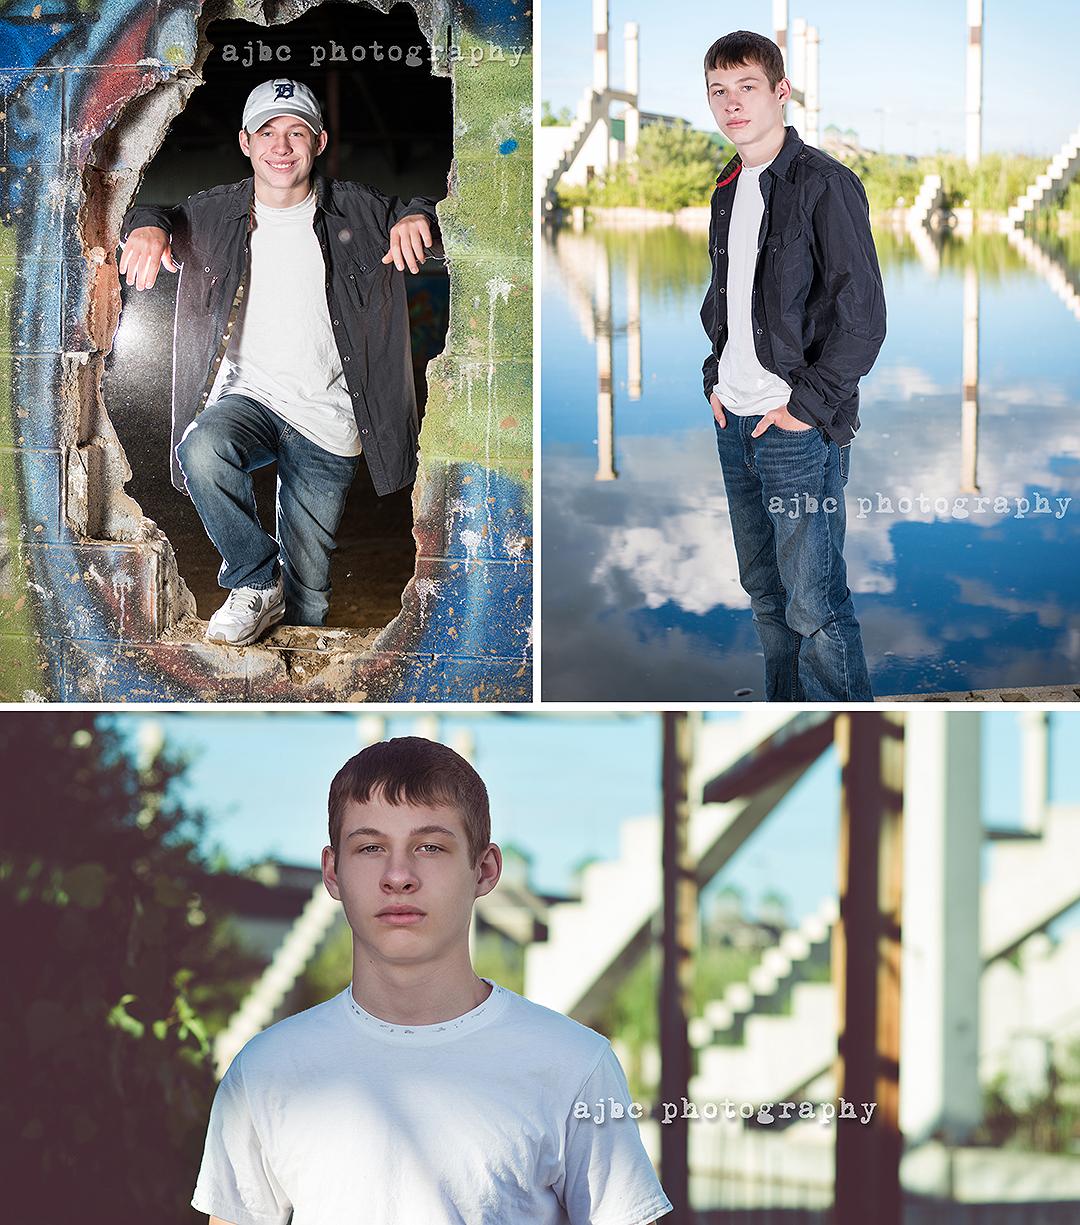 AJBC Photography teenager boy Port Huron Michigan Photographer graffiti creative portraits